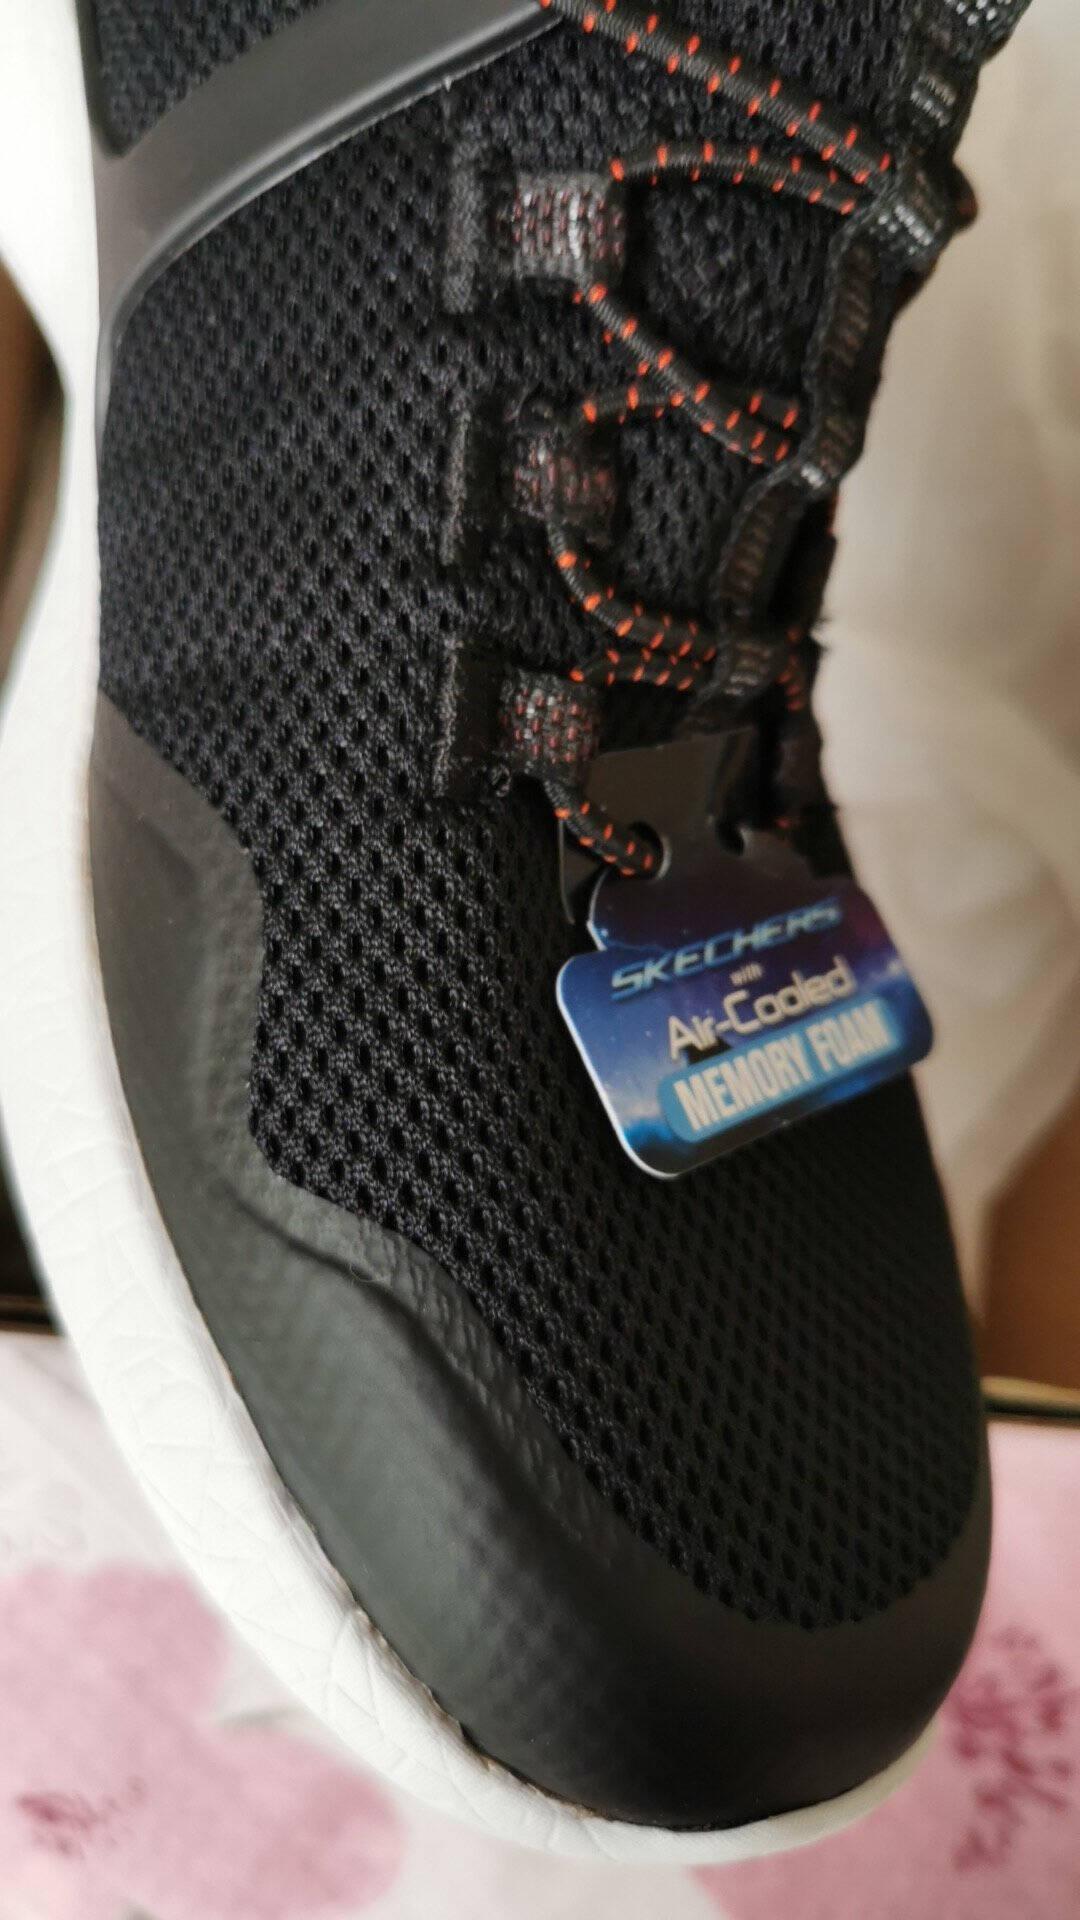 Skechers斯凯奇男鞋橡筋一脚套运动鞋舒适透气休闲鞋666082NVY海军蓝色42